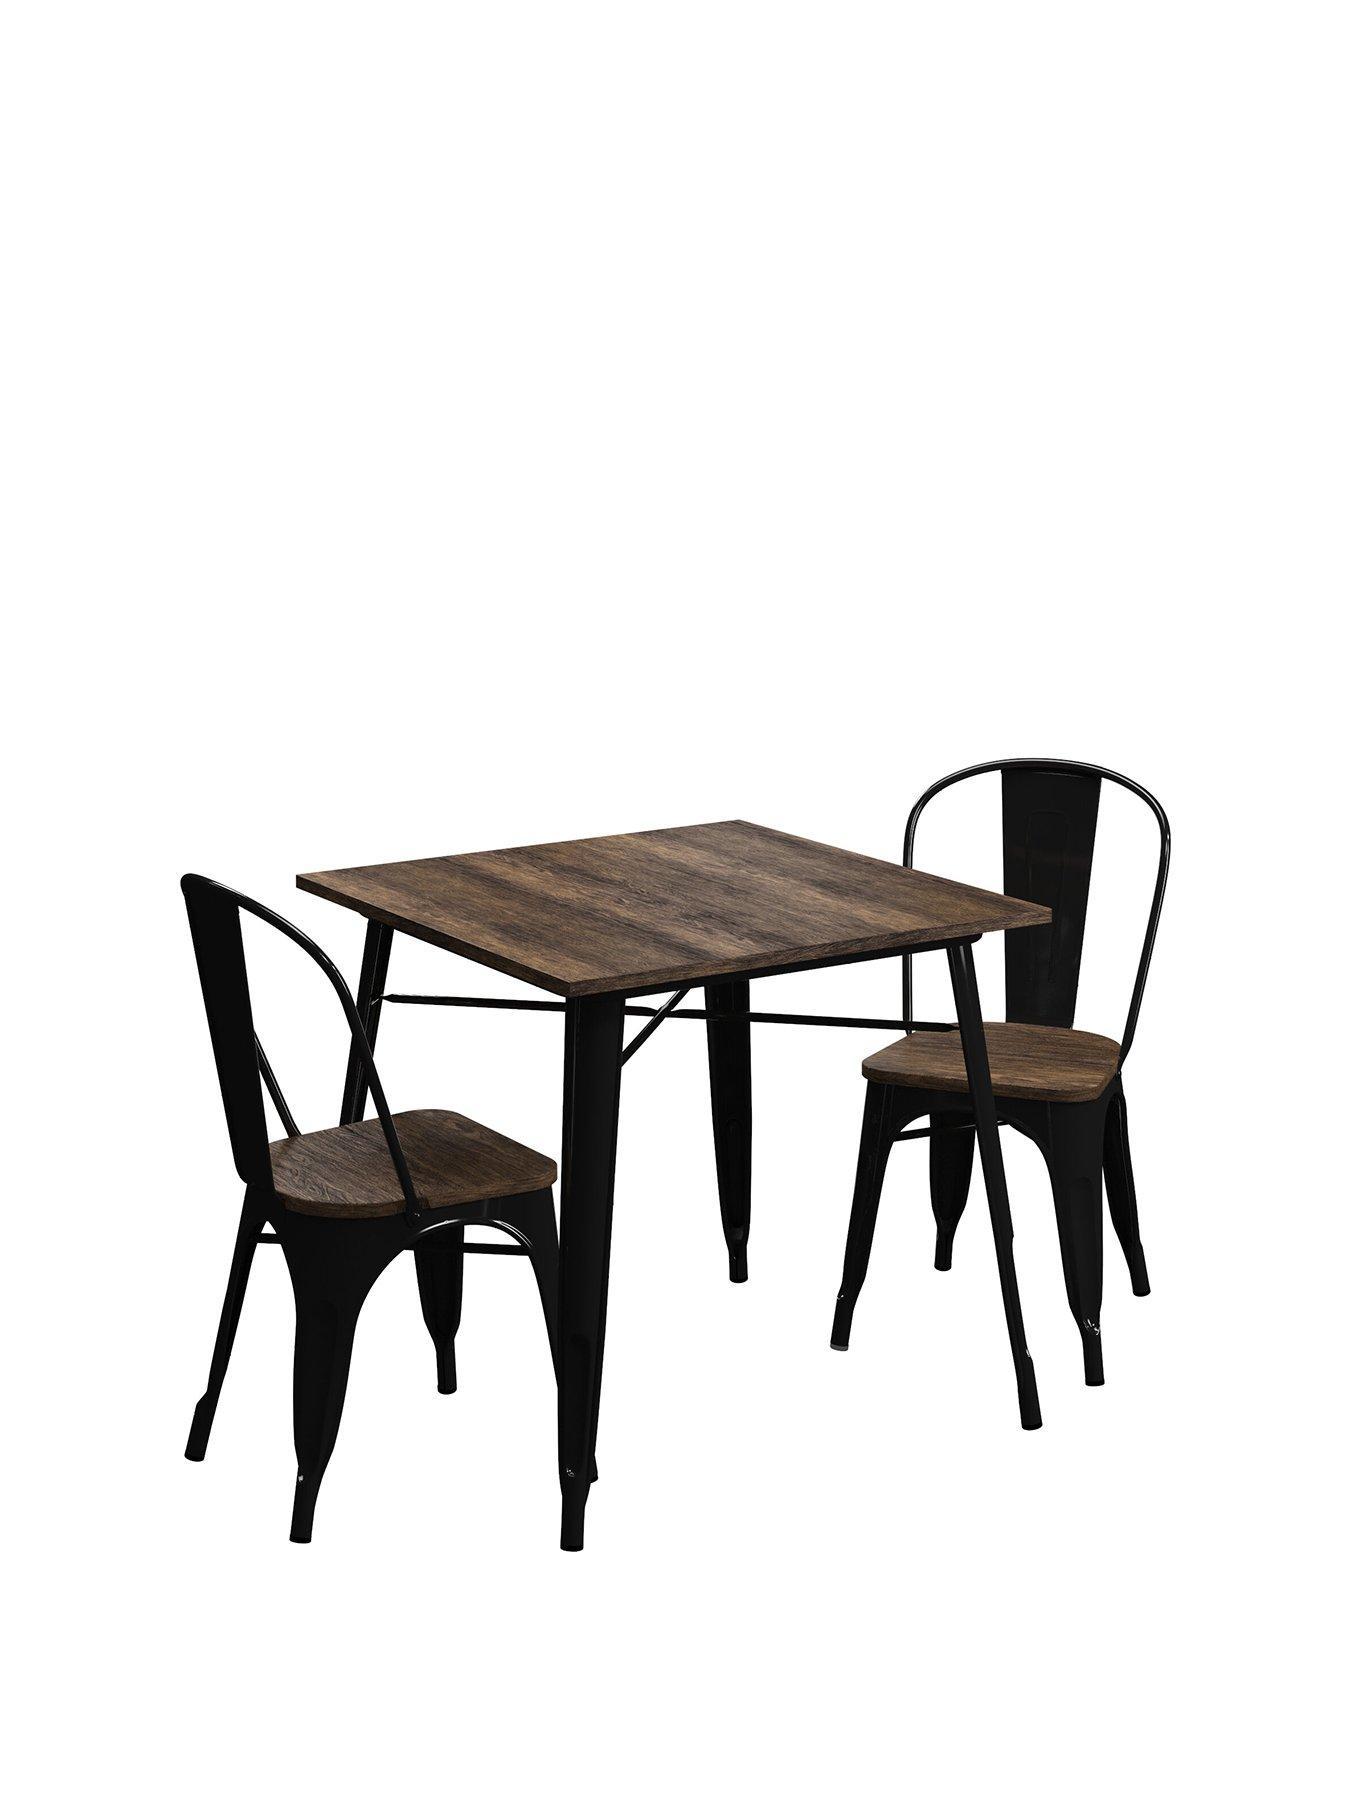 Paris Beech Dining Tables 75 x 50 x 75 cm